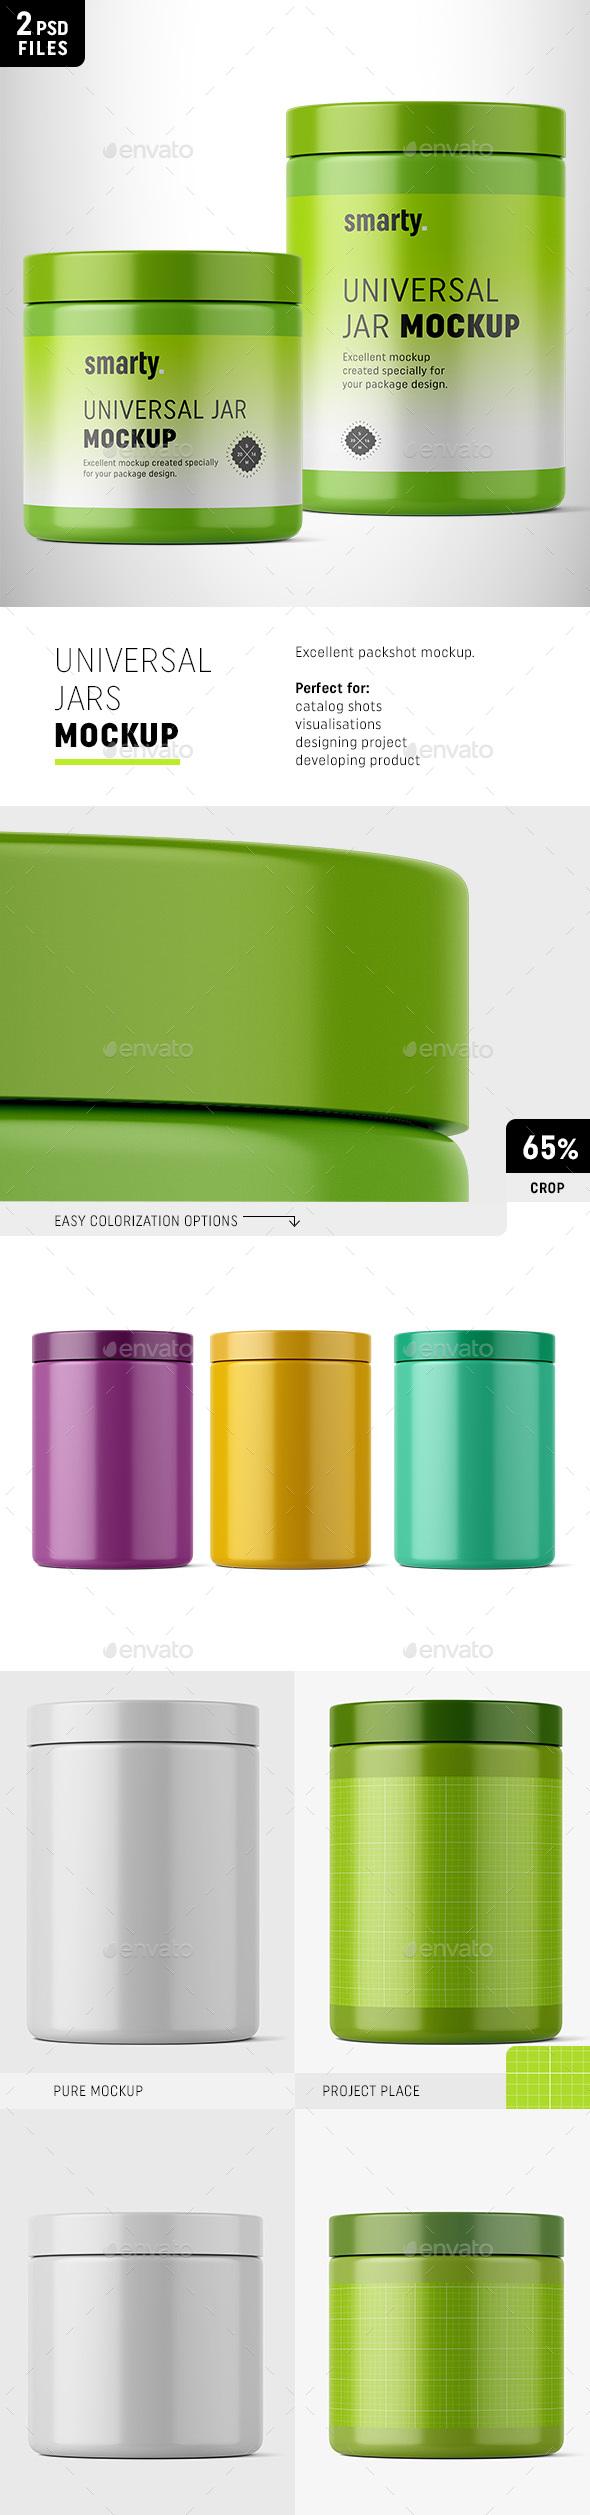 Universal Plastic Jar Mockups - Packaging Product Mock-Ups